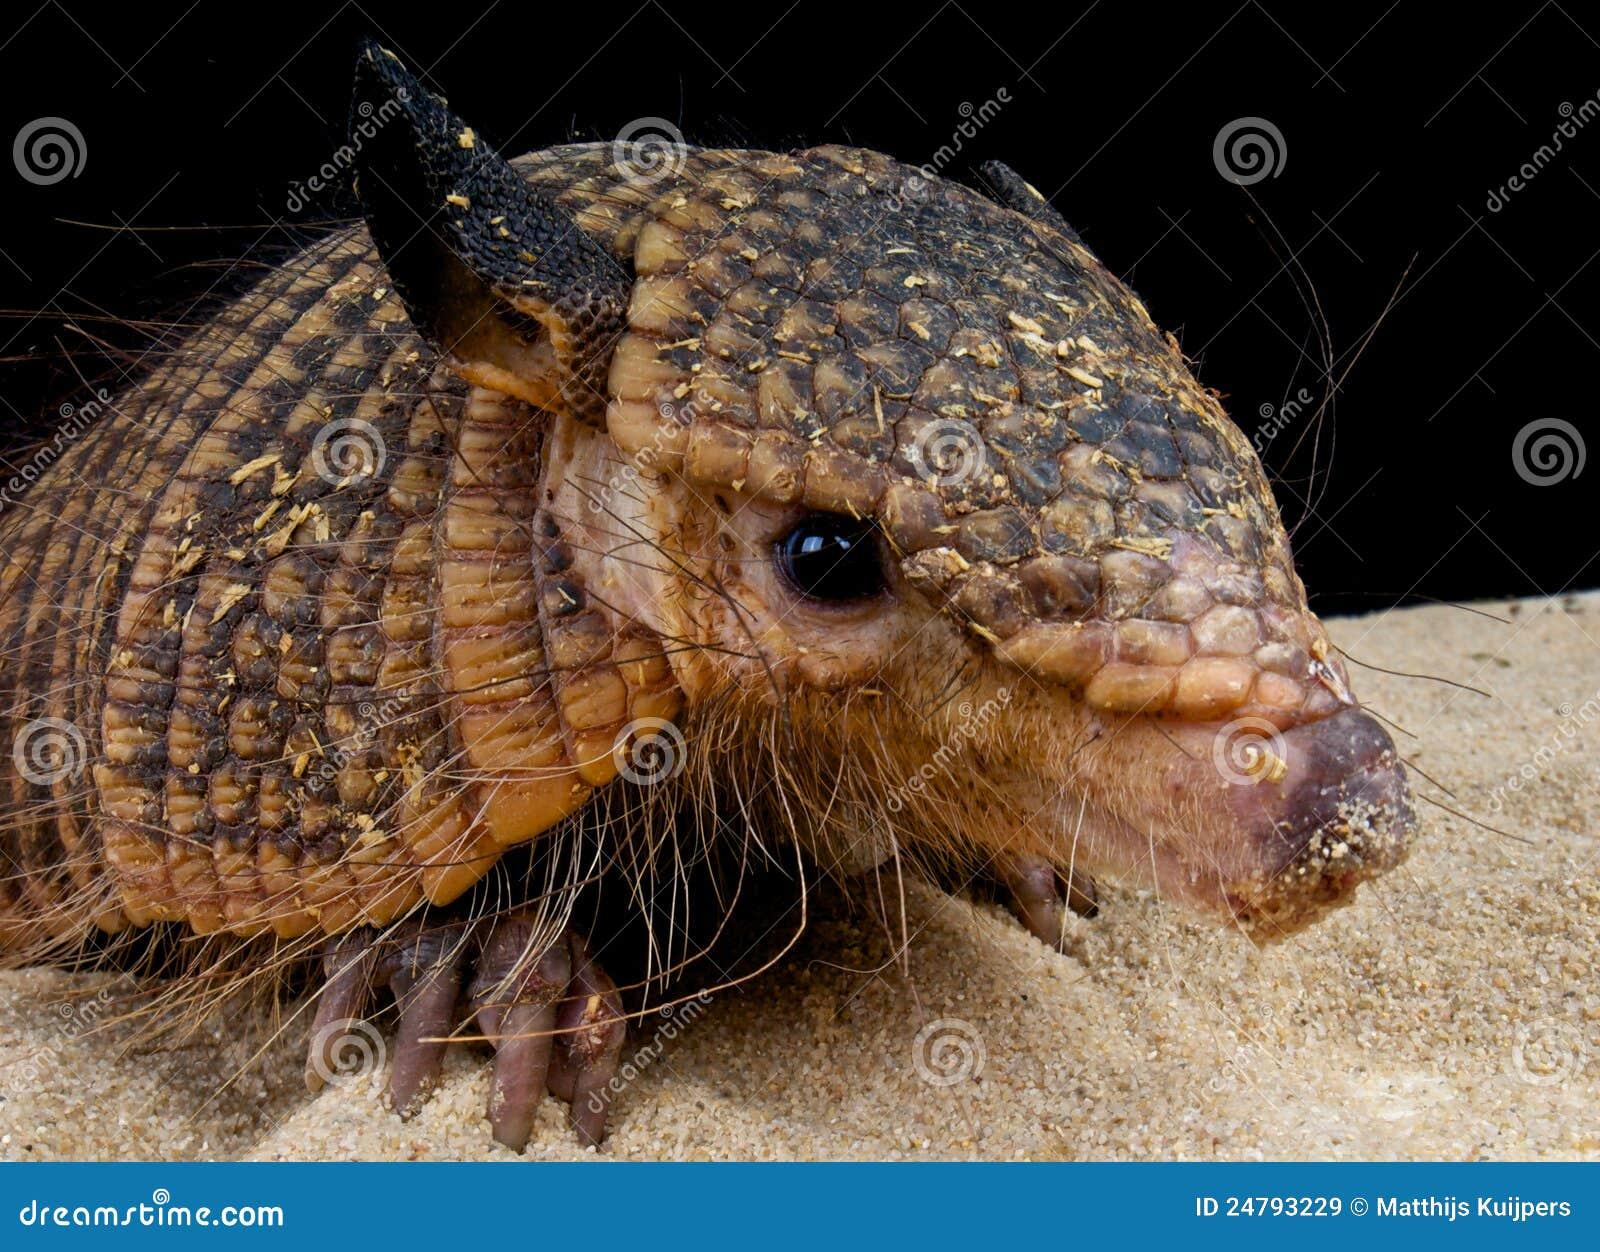 hairy armadillo stock image. image of pampas, armadillo - 24793229